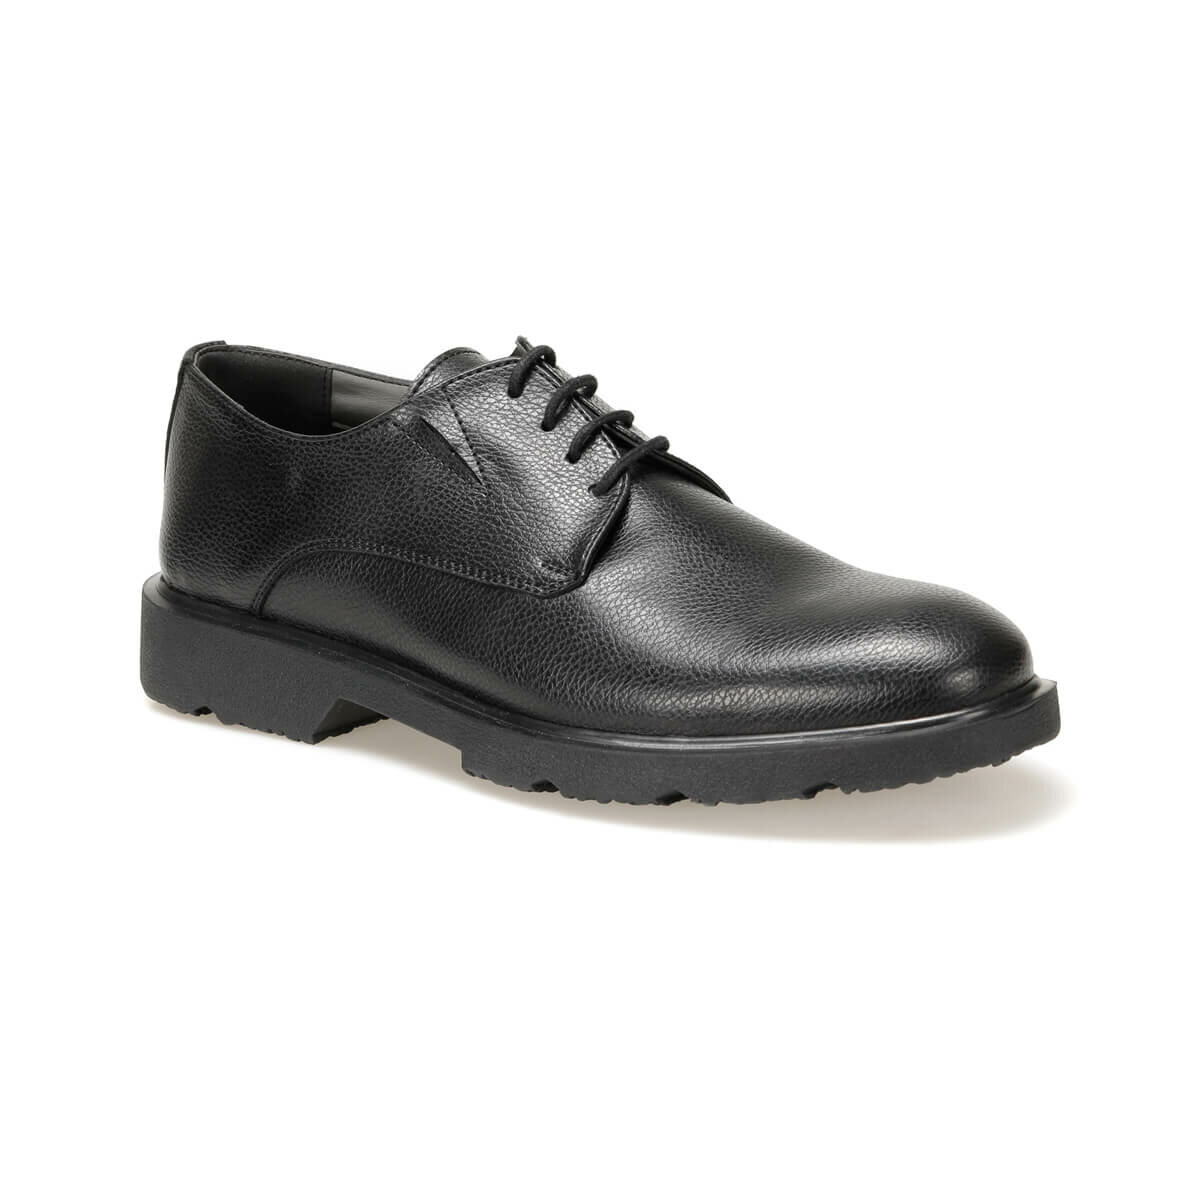 FLO 1710 Black Men 'S Classic Shoes JJ-Stiller